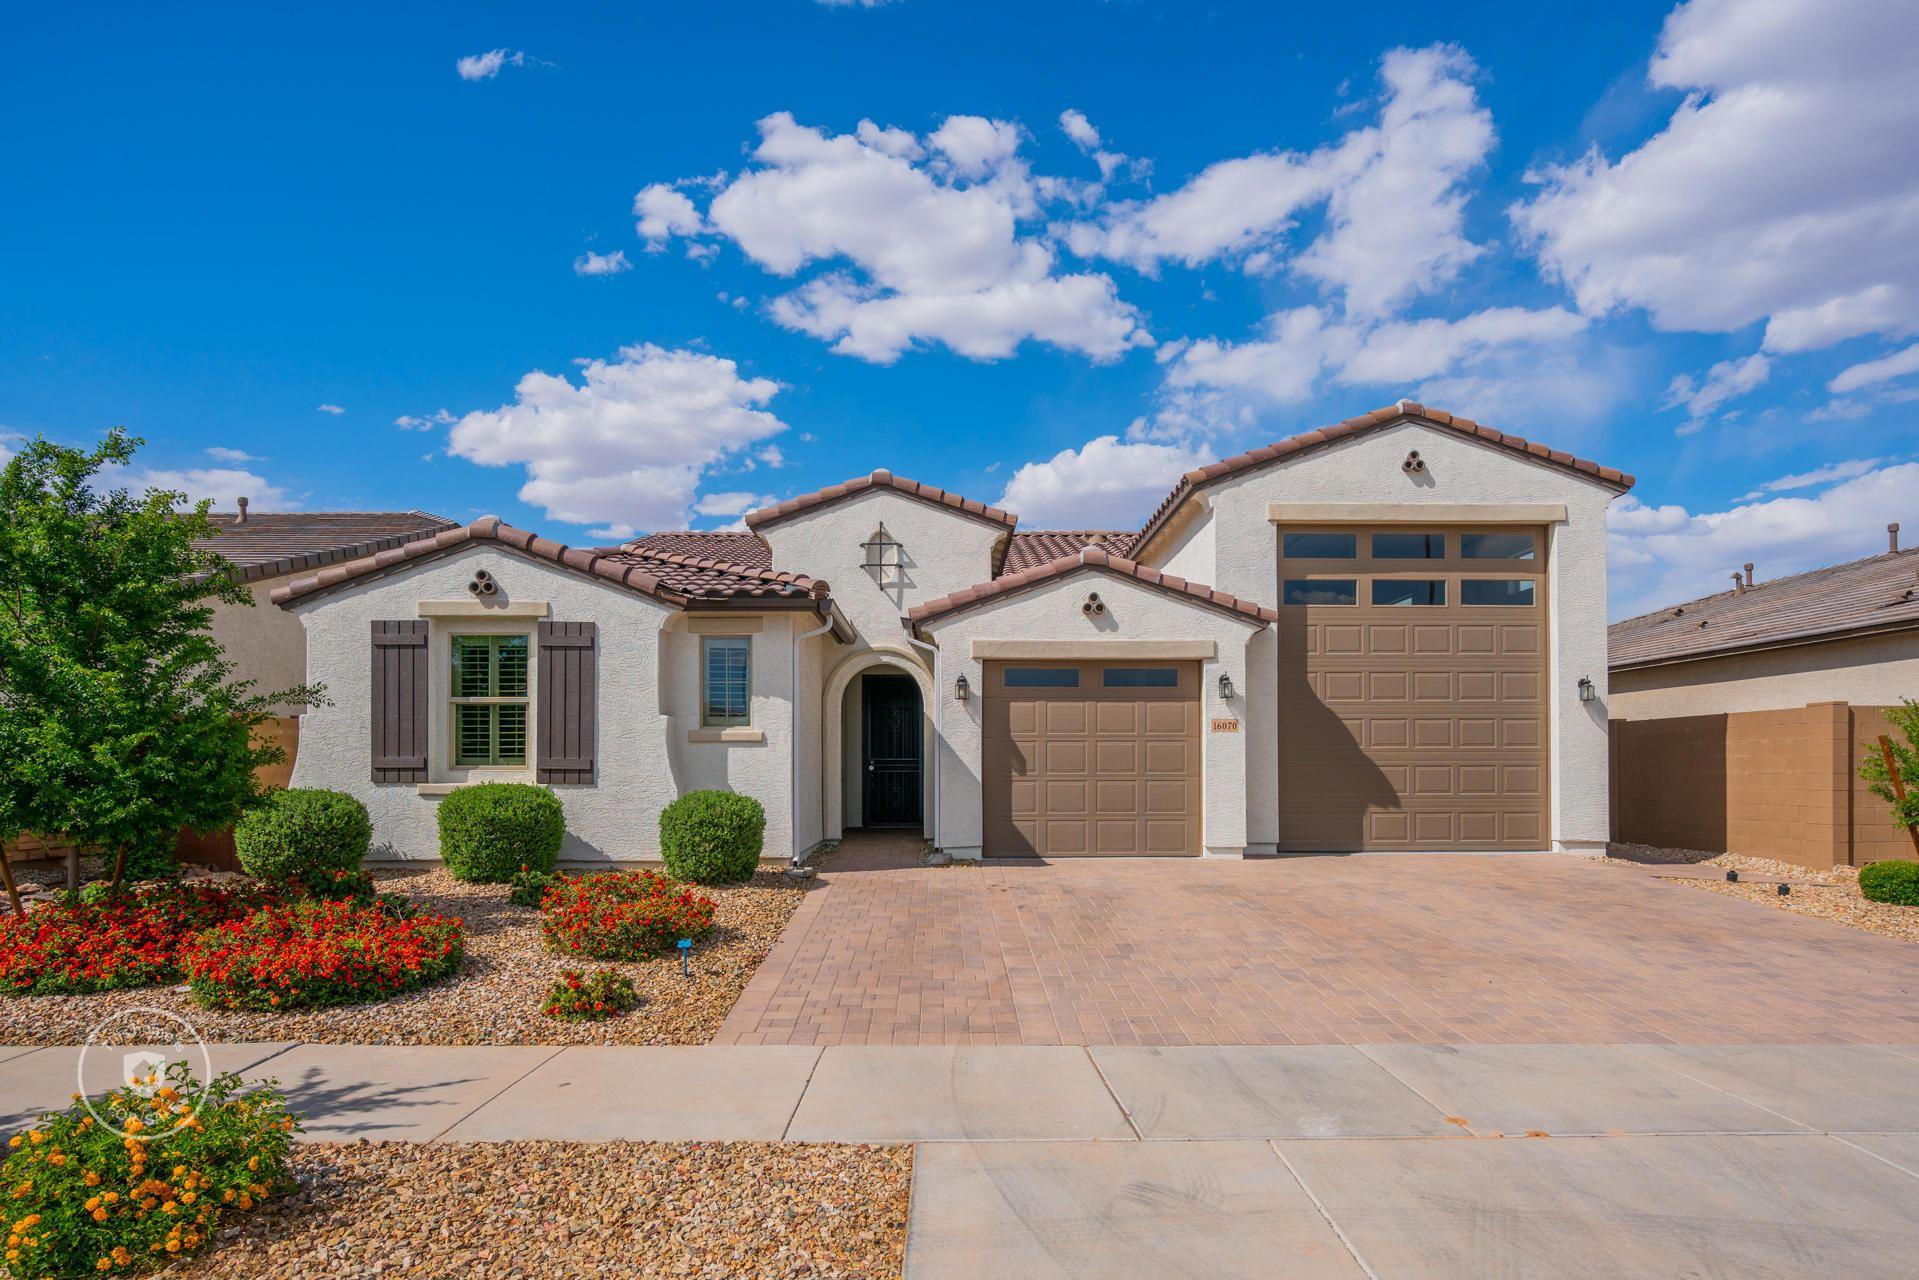 16070 W DESERT HILLS Drive, Surprise, AZ 85379 - #: 6223725